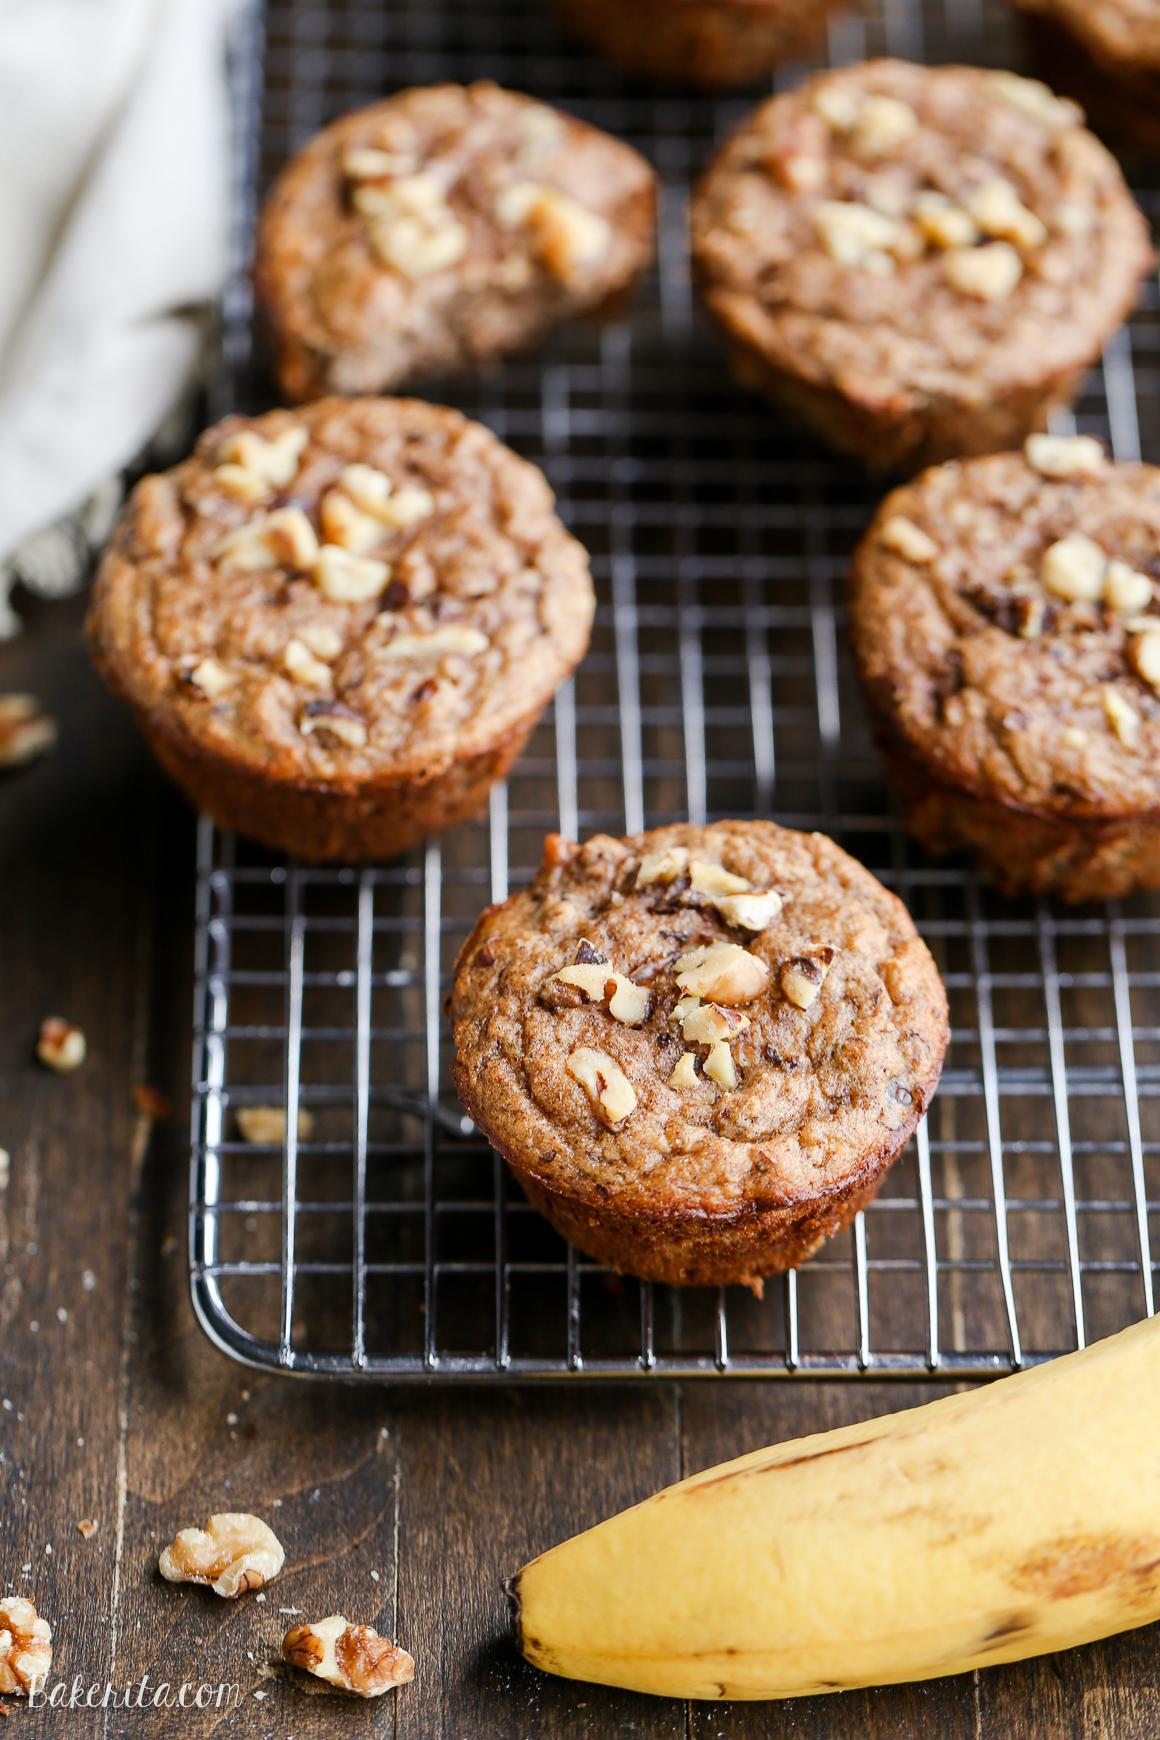 Recipe of the week - Banana nut muffin